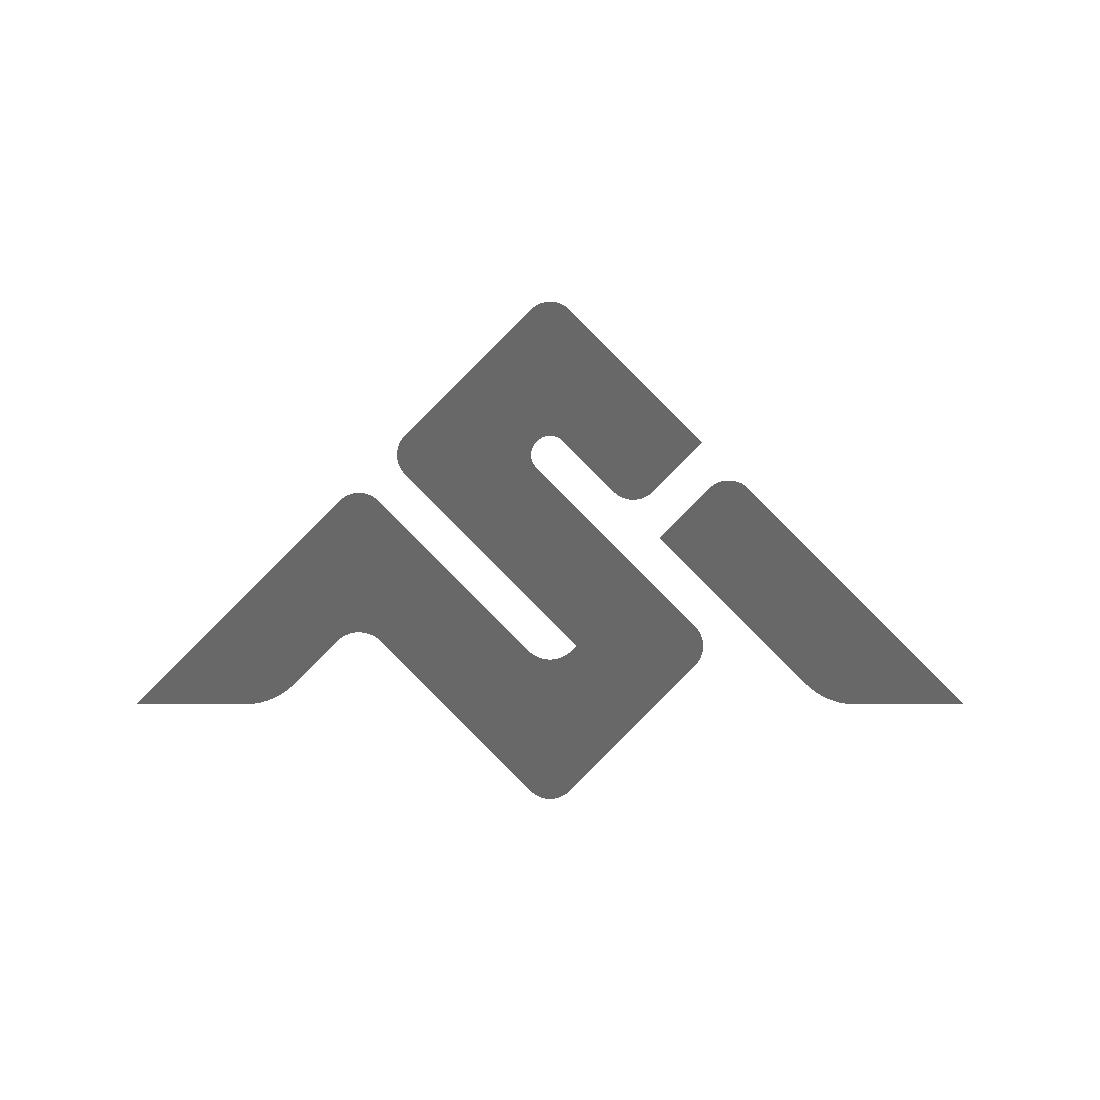 2020 Snowboard De Tls Homme Noir Team Boots Nitro kuXZPOi